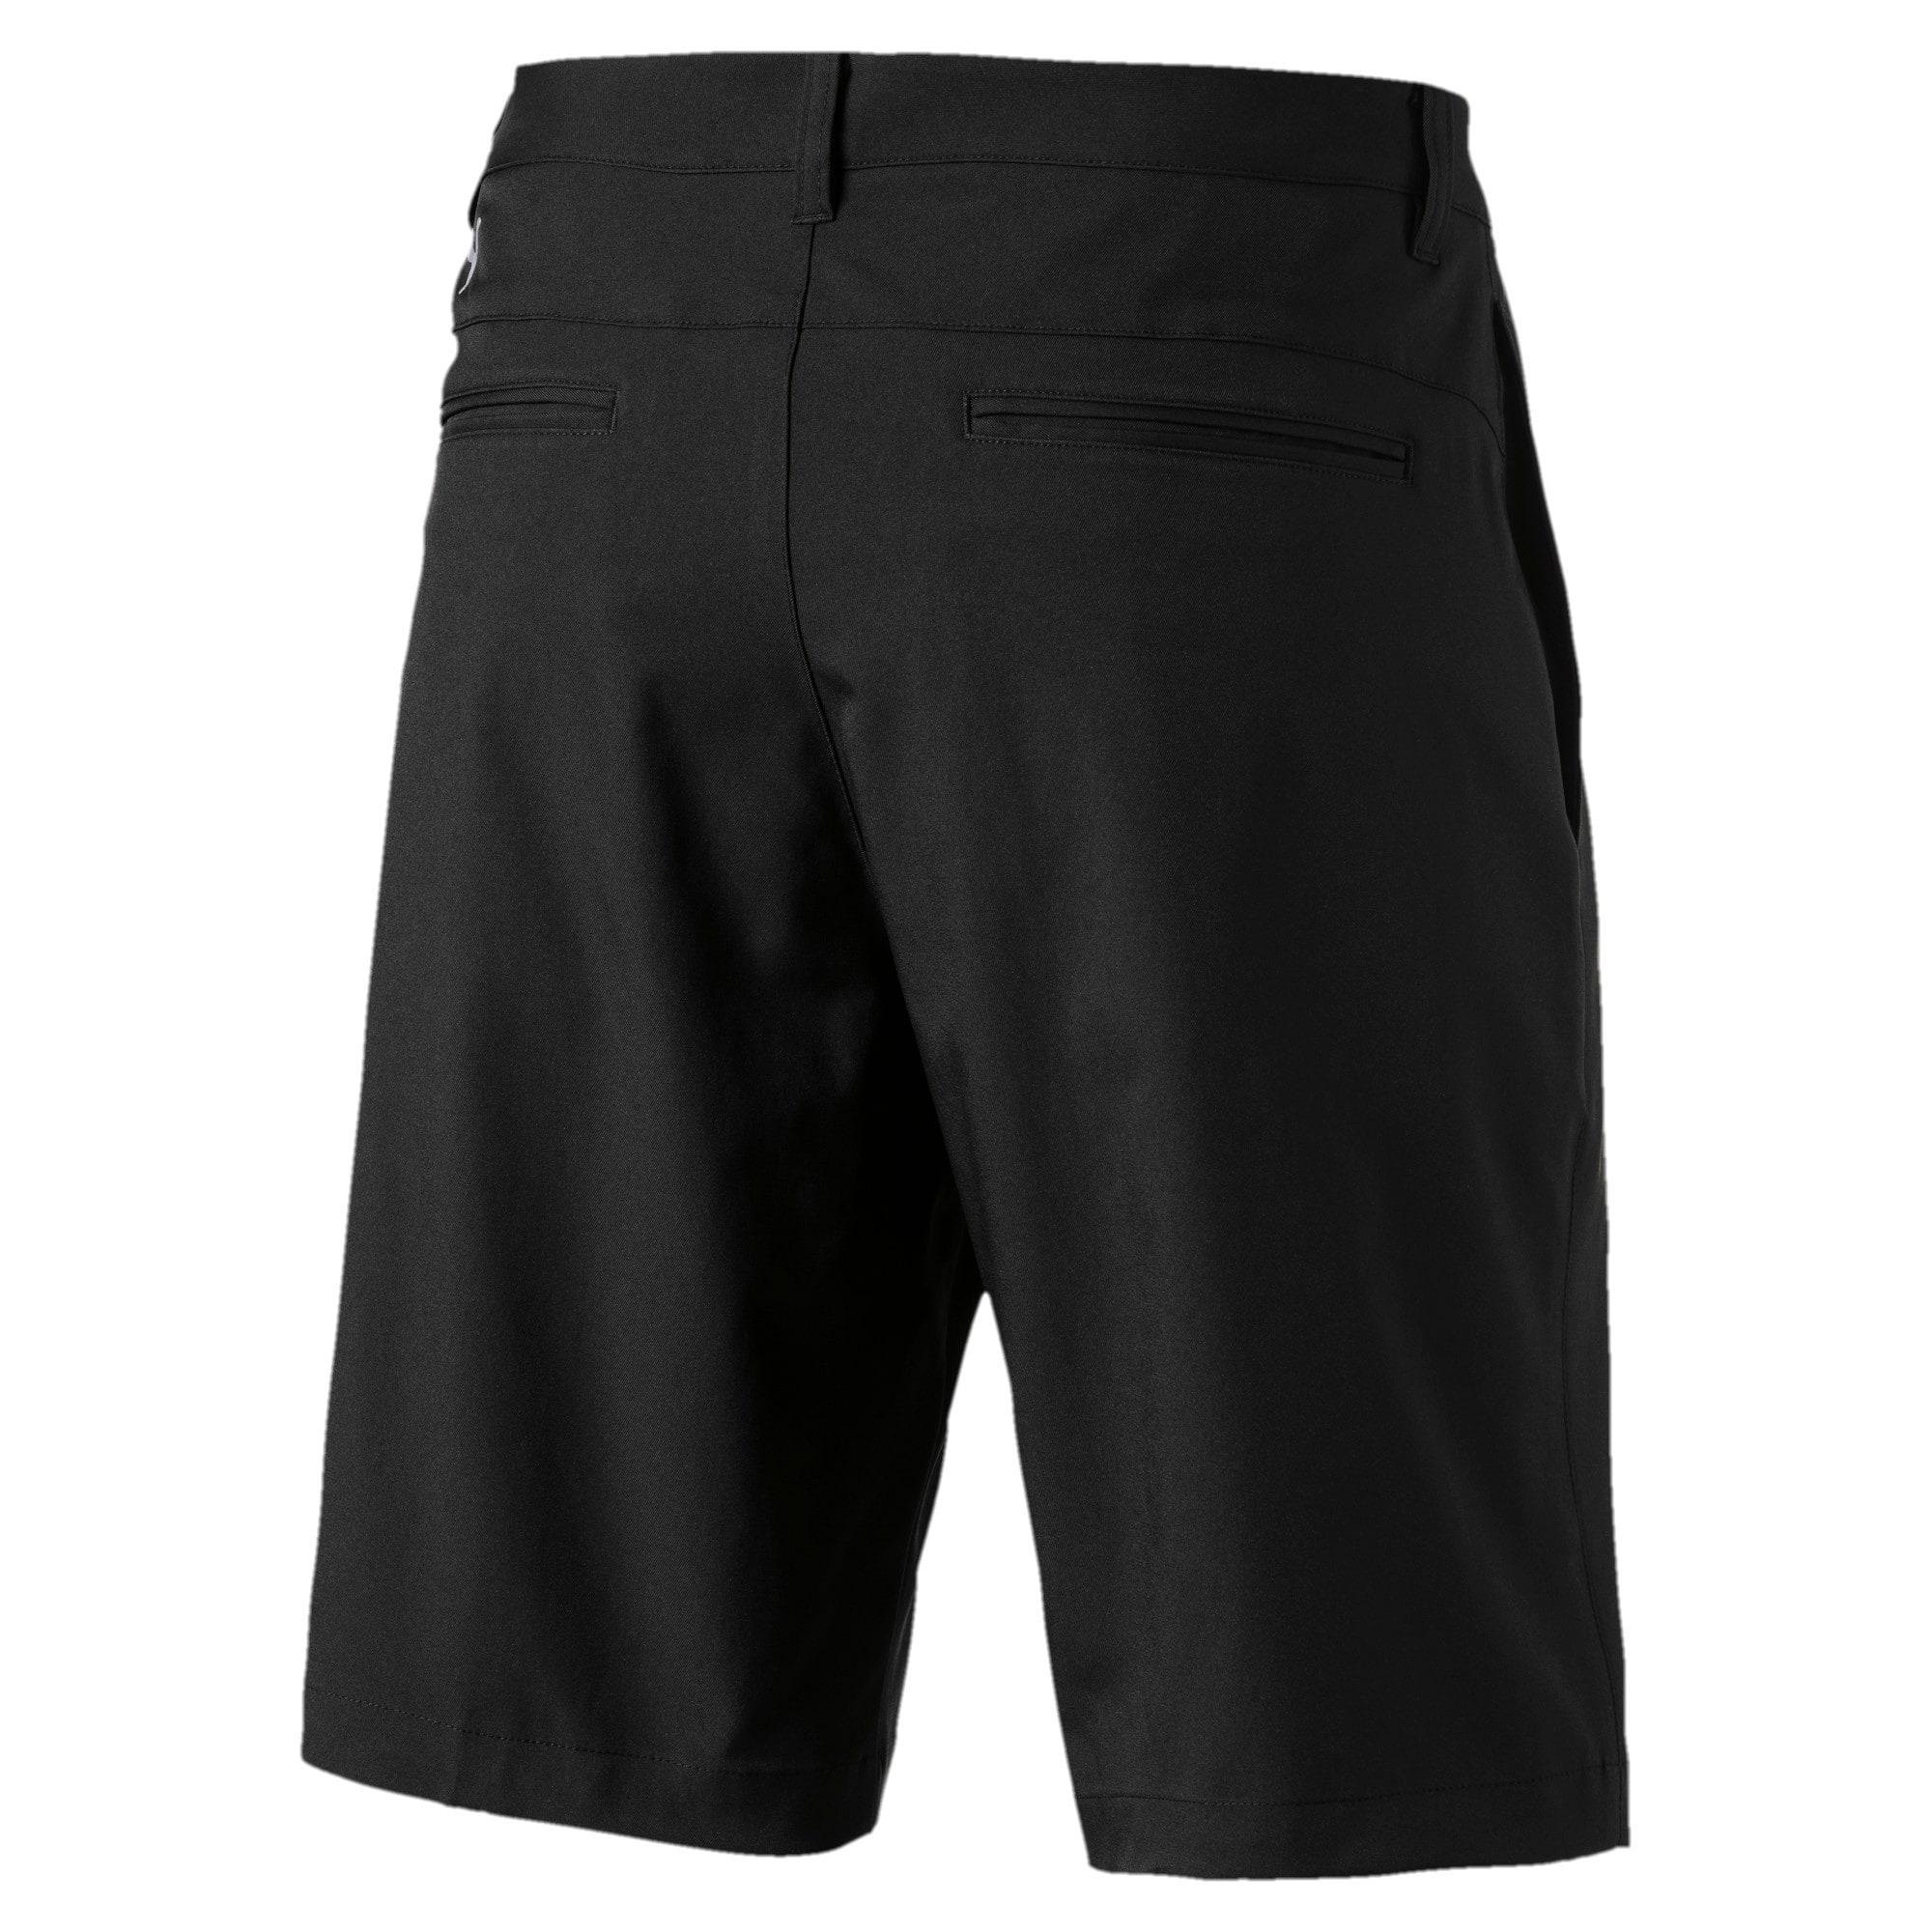 Thumbnail 2 of Jackpot Men's Shorts, Puma Black, medium